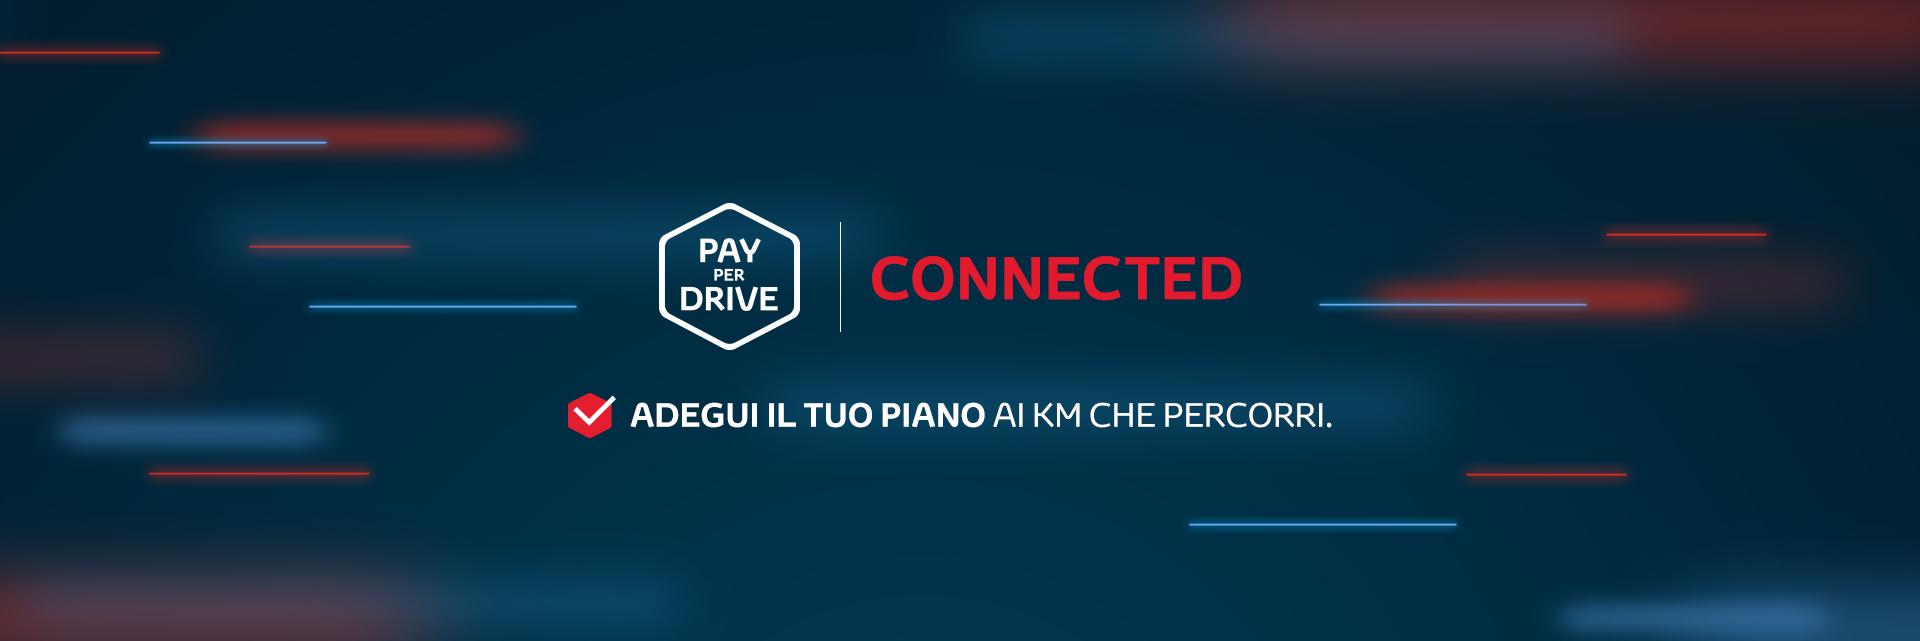 Pay per Drive Toyota: Scopri tutti i dettagli